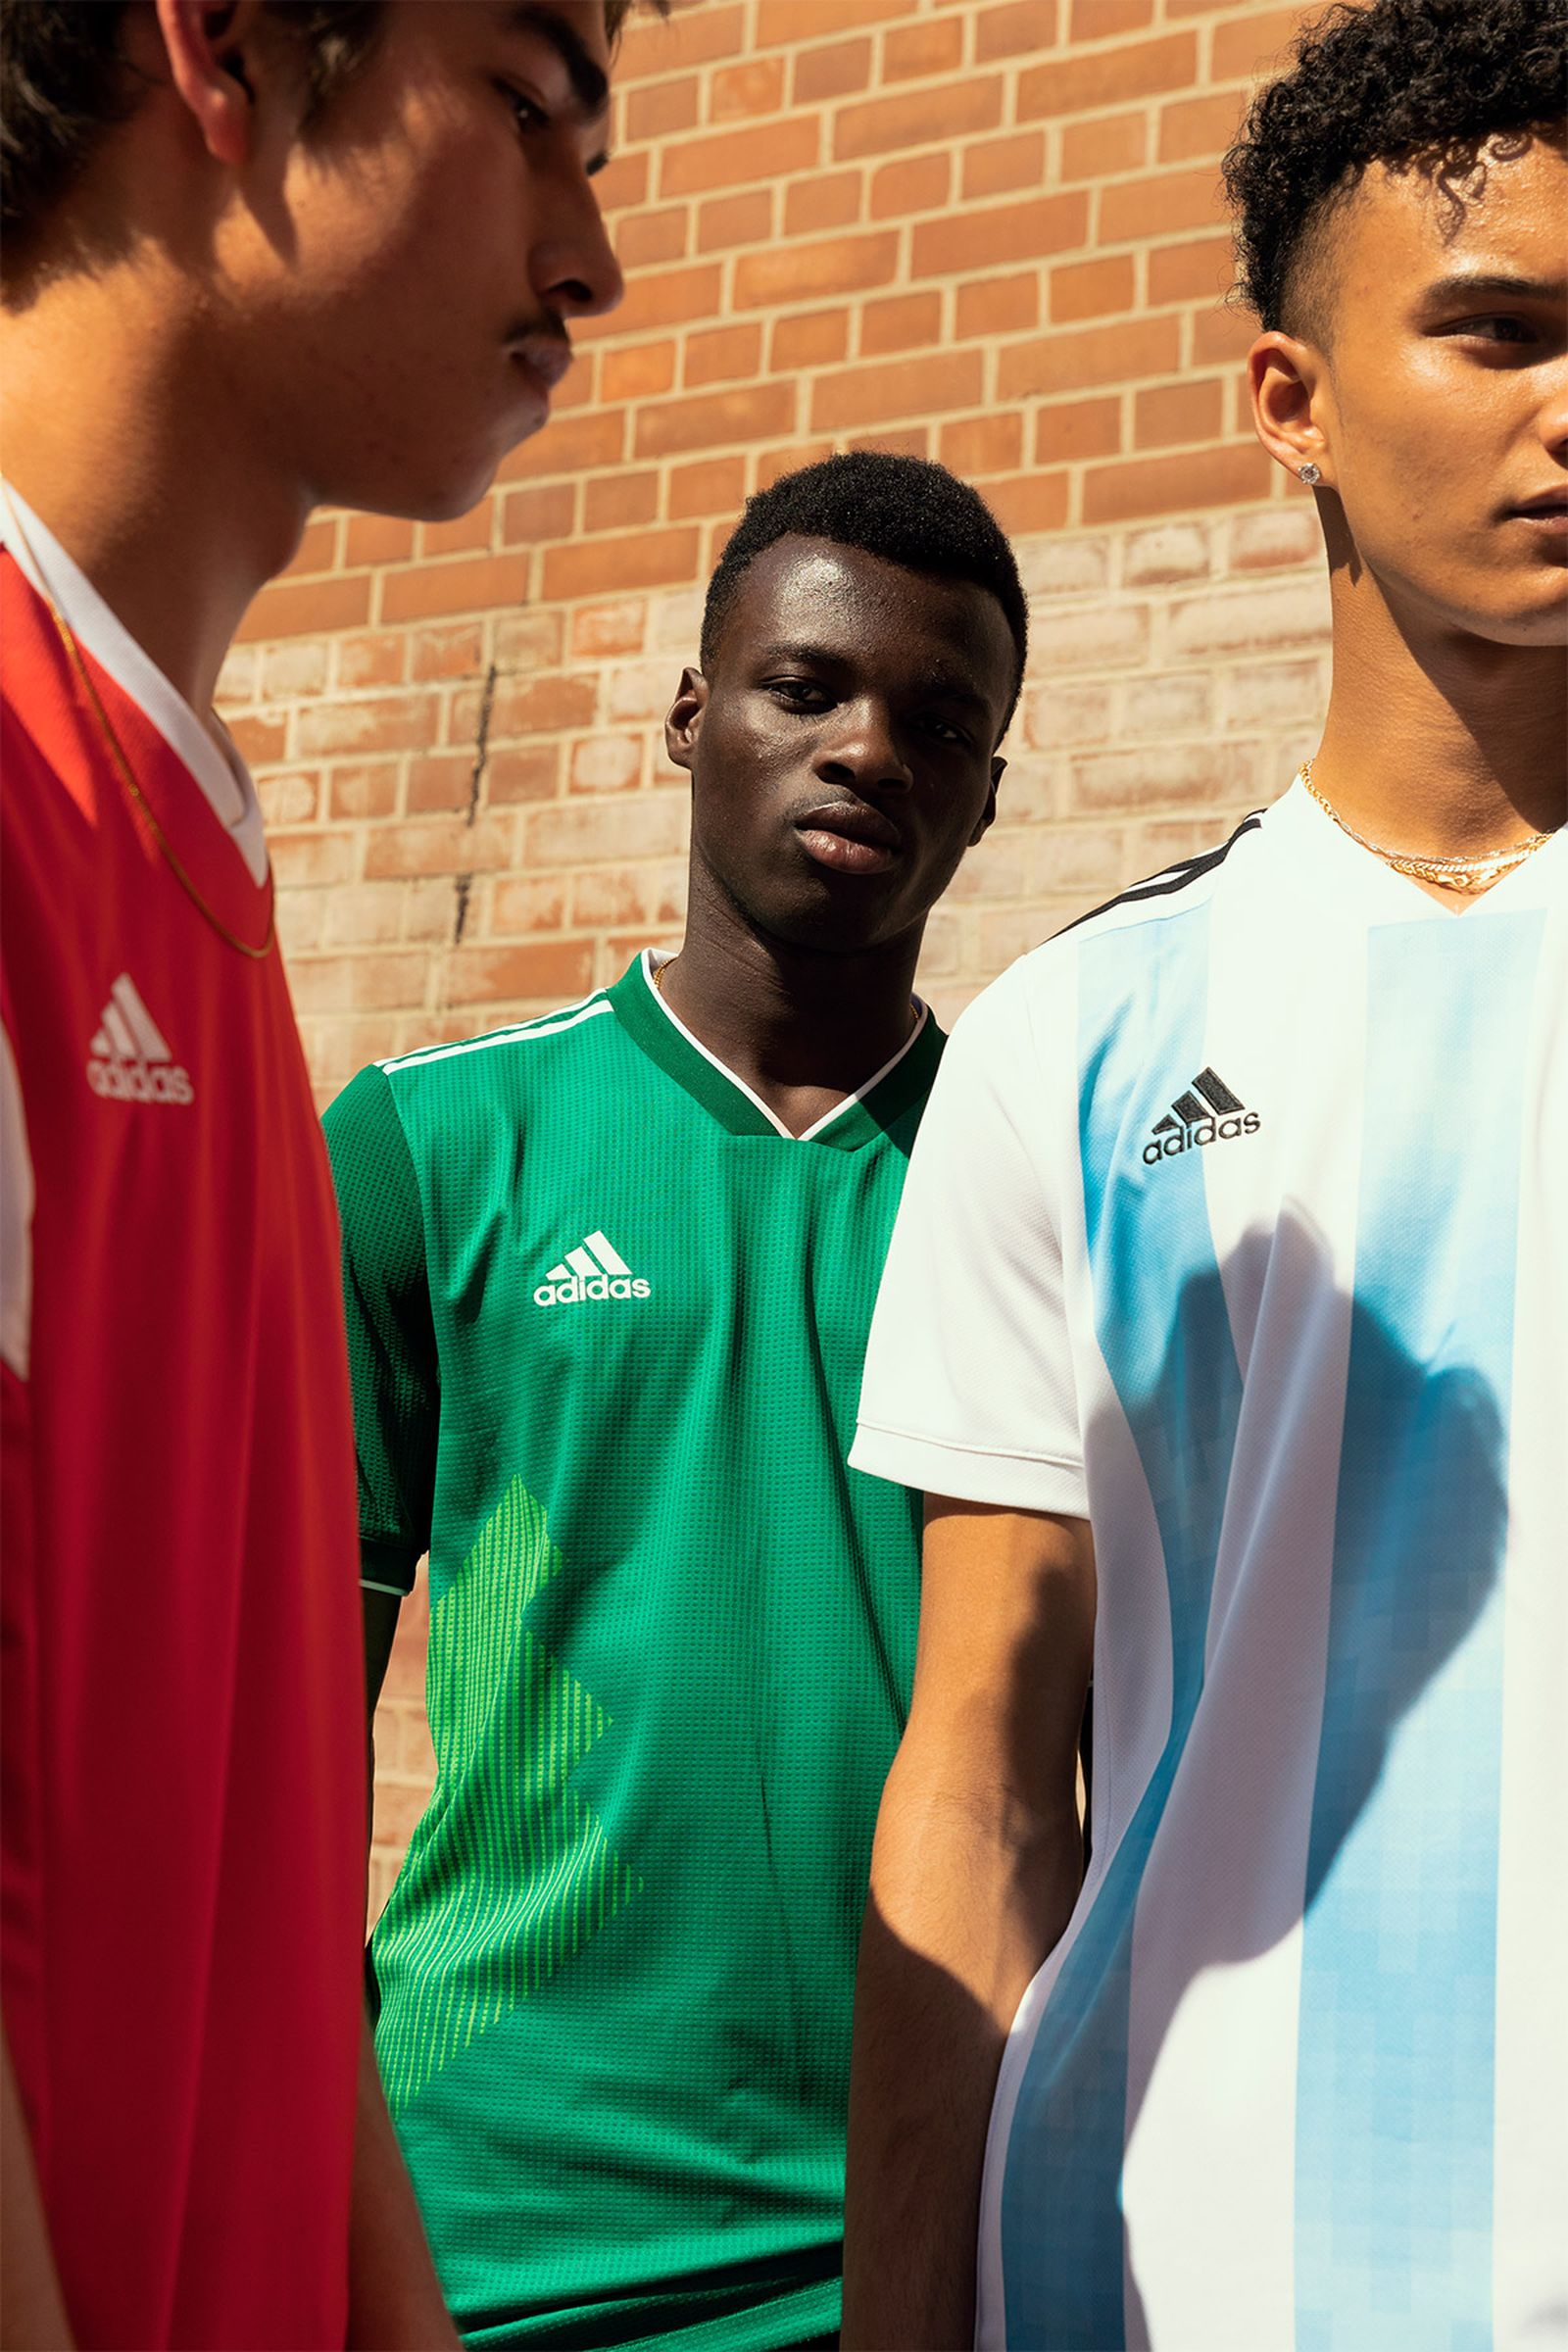 adidas-football-2018-world-cup-jerseys-10